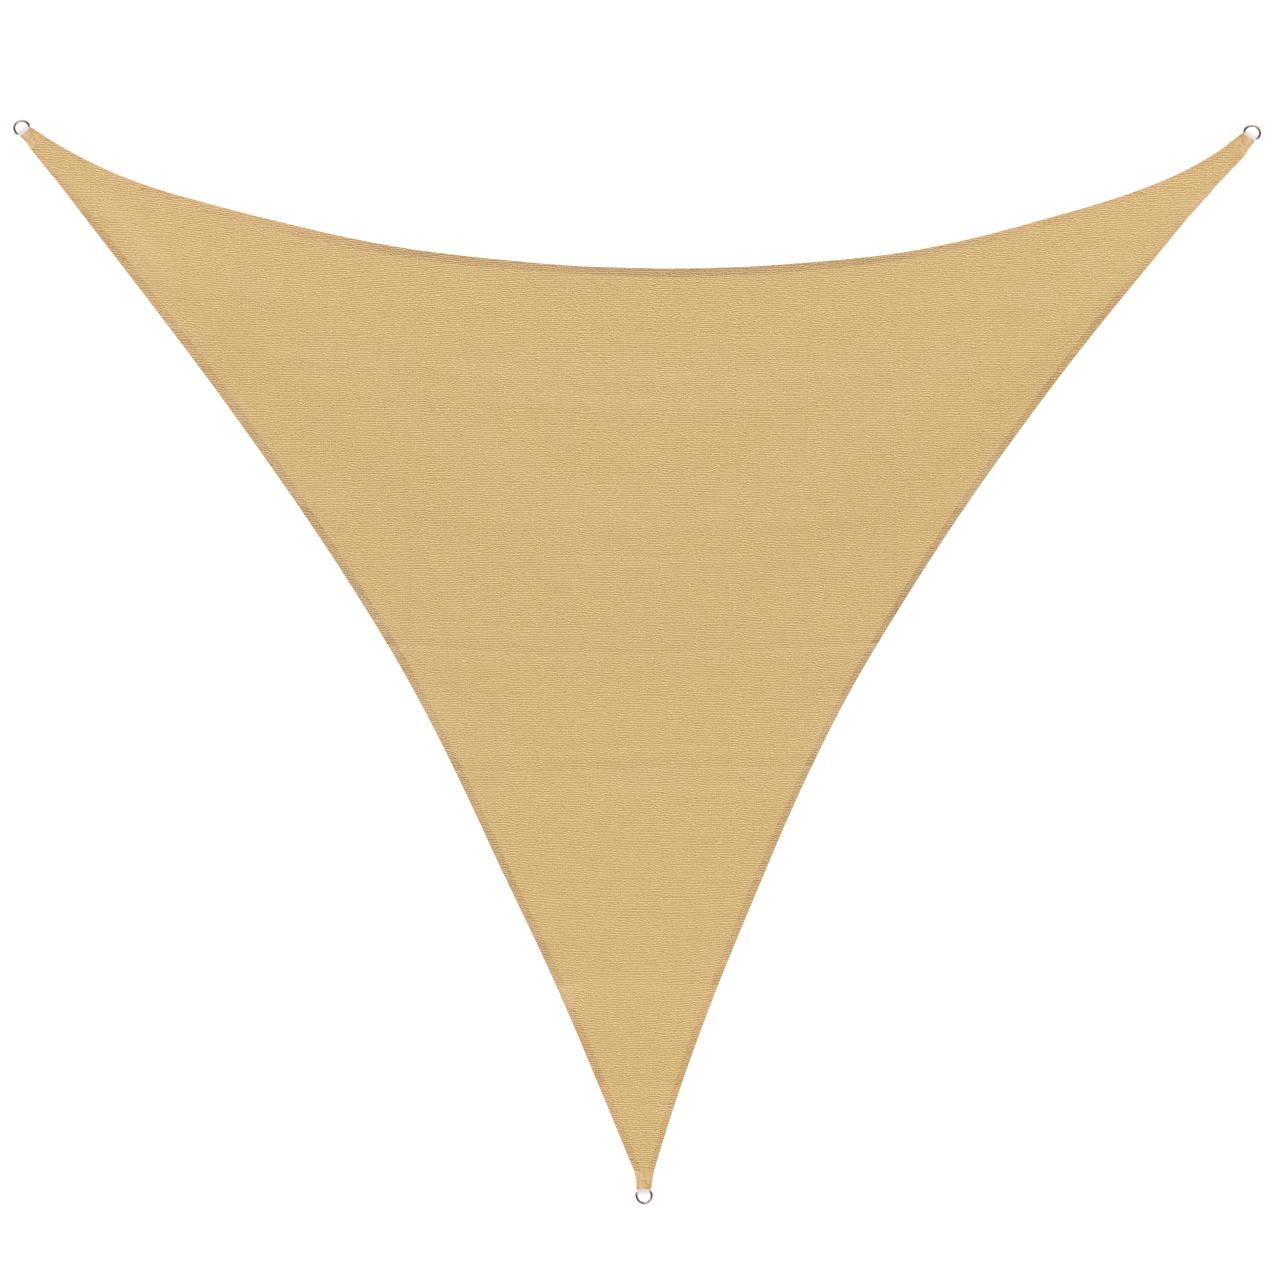 sonnensegel sonnenschutz garten sonnendach uv schutz beschattung dreieck ebay. Black Bedroom Furniture Sets. Home Design Ideas